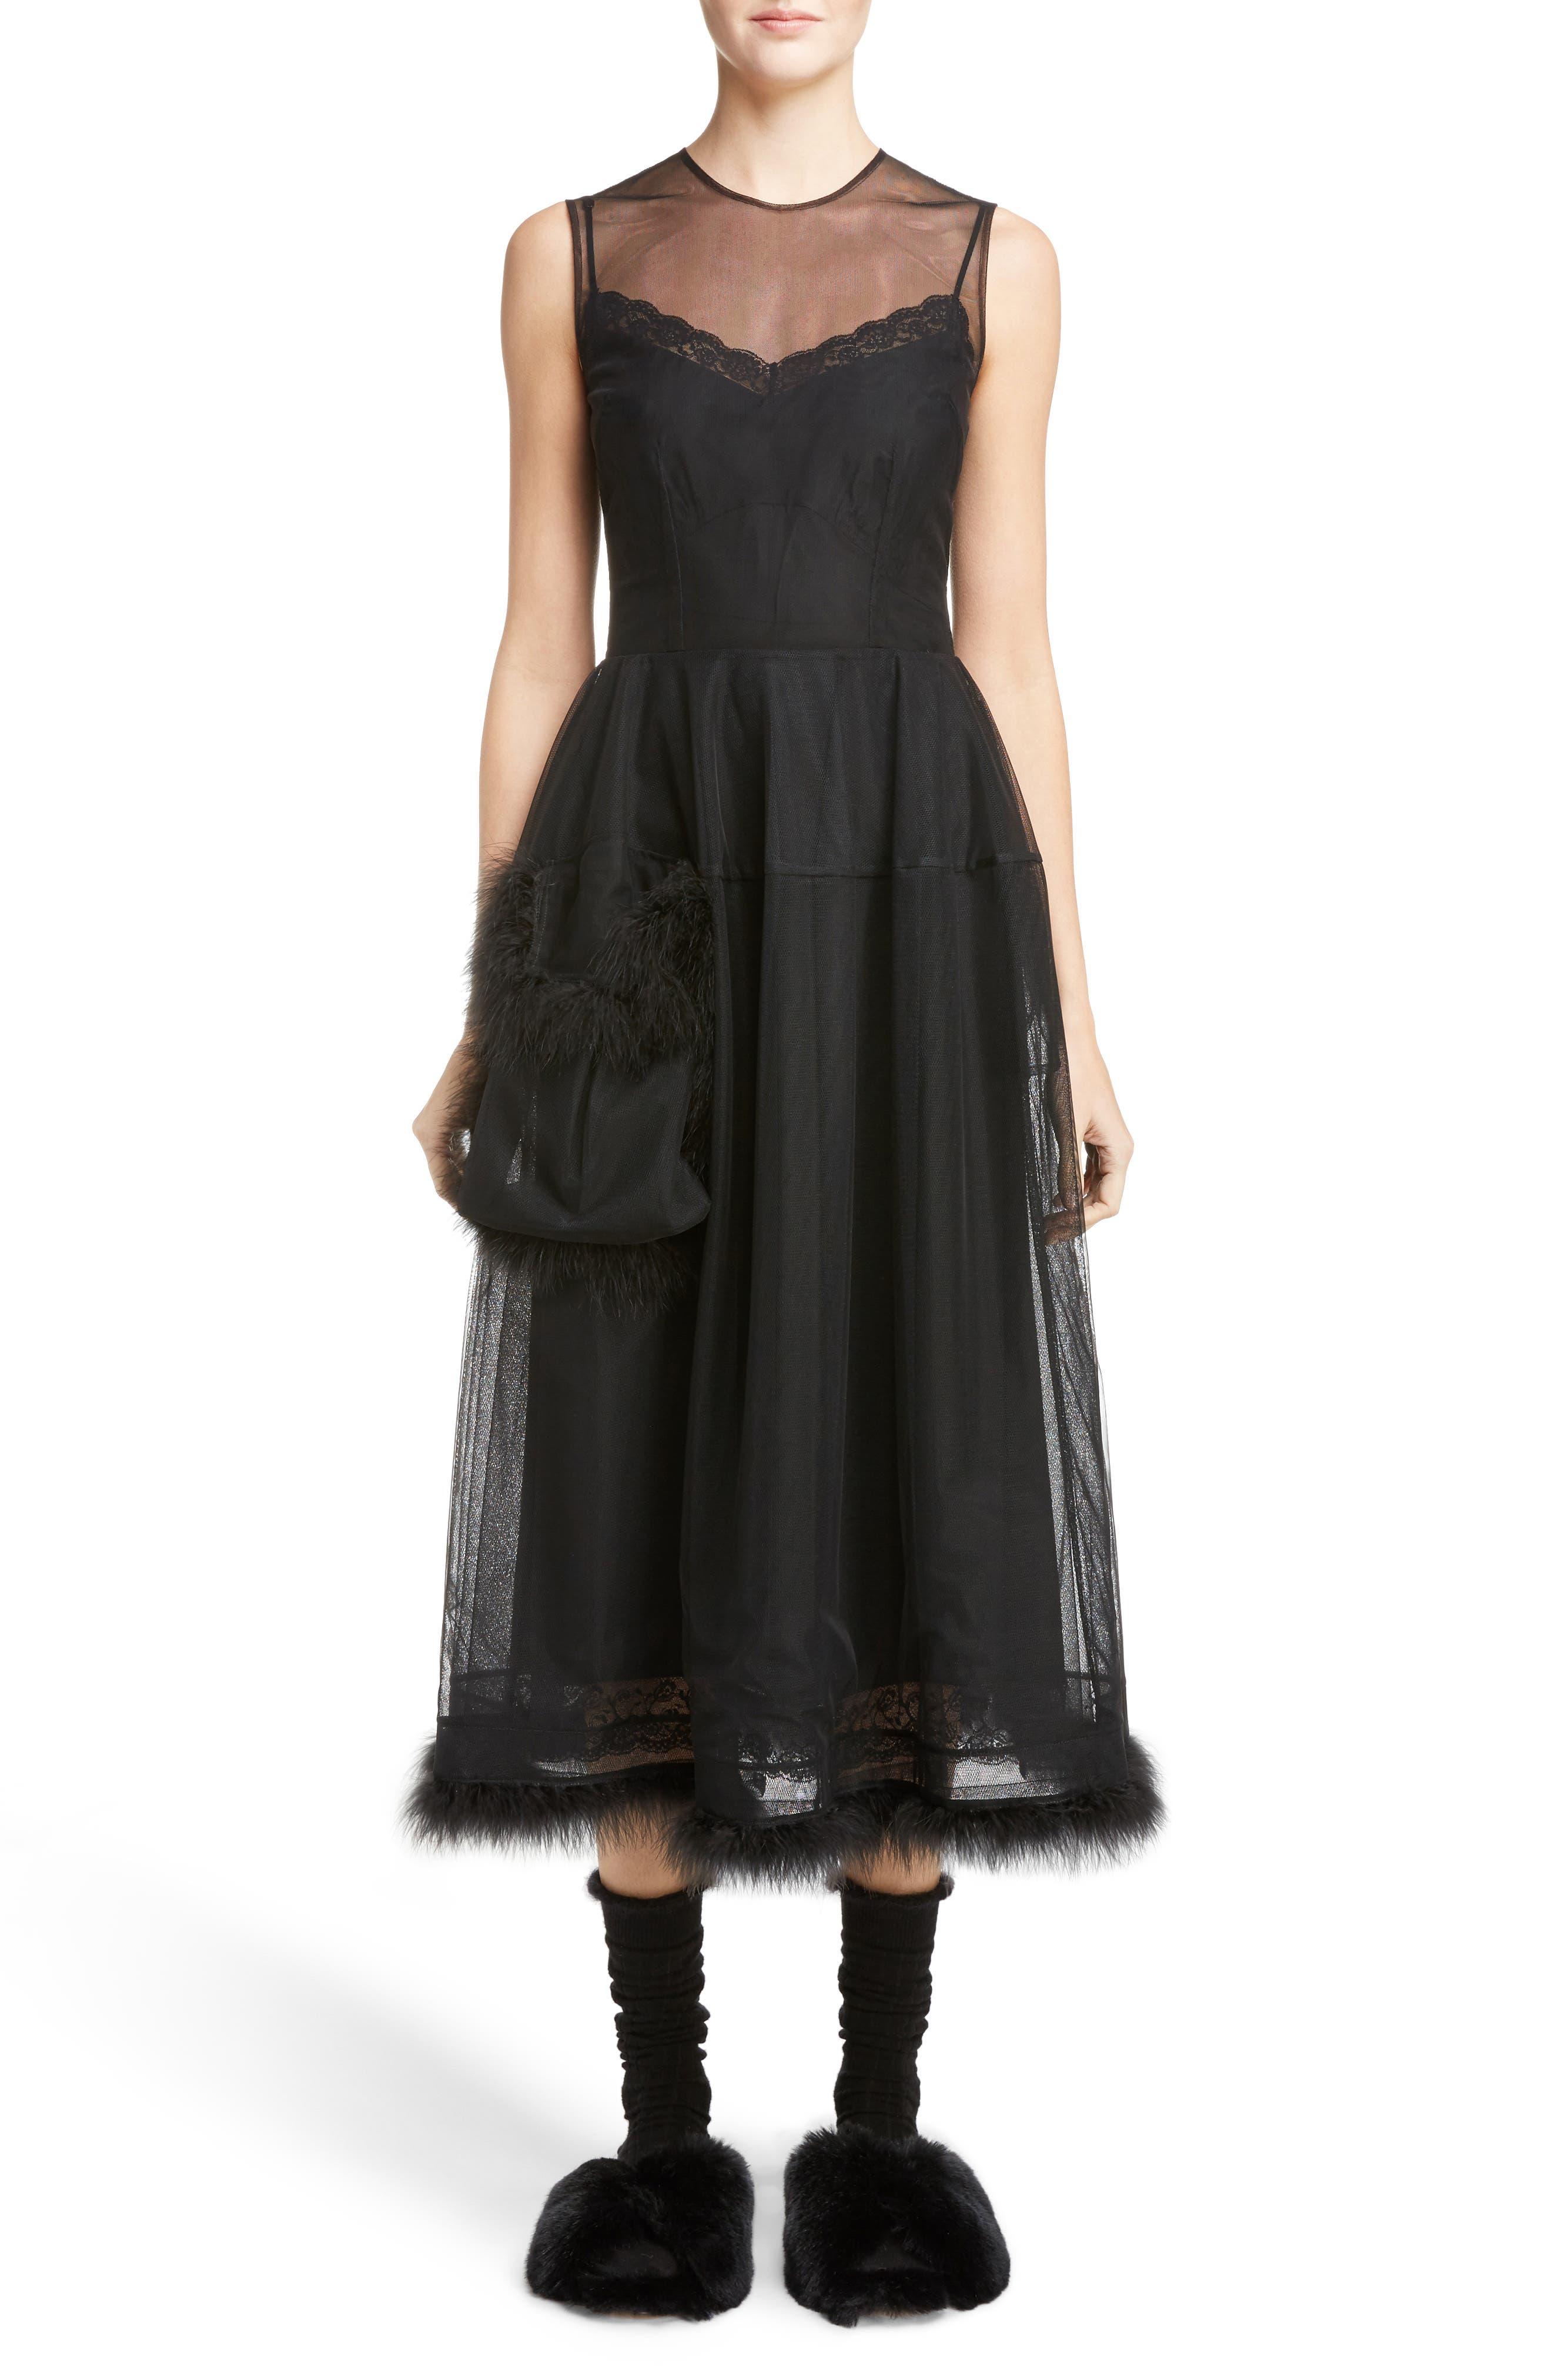 Alternate Image 1 Selected - Simone Rocha Teddy Feather Trim Tulle Dress